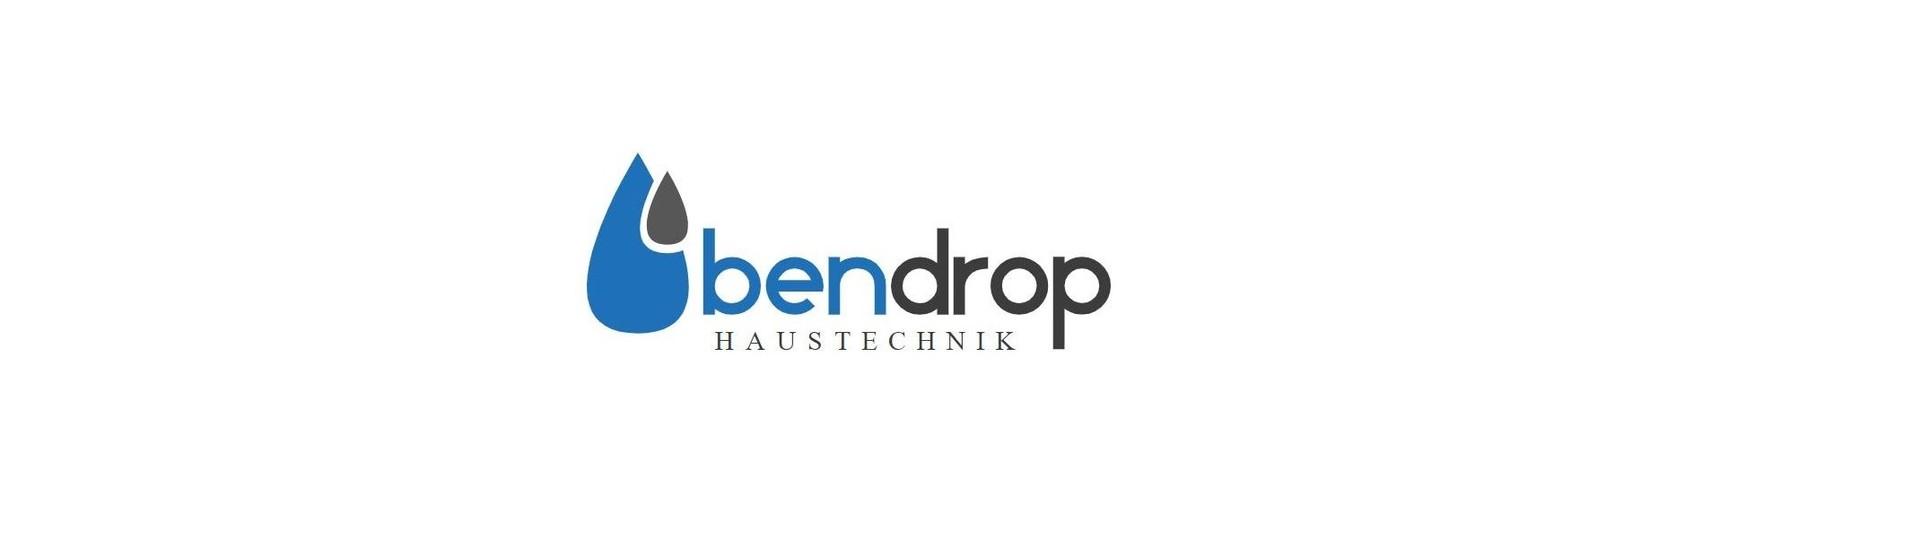 bendrop GmbH